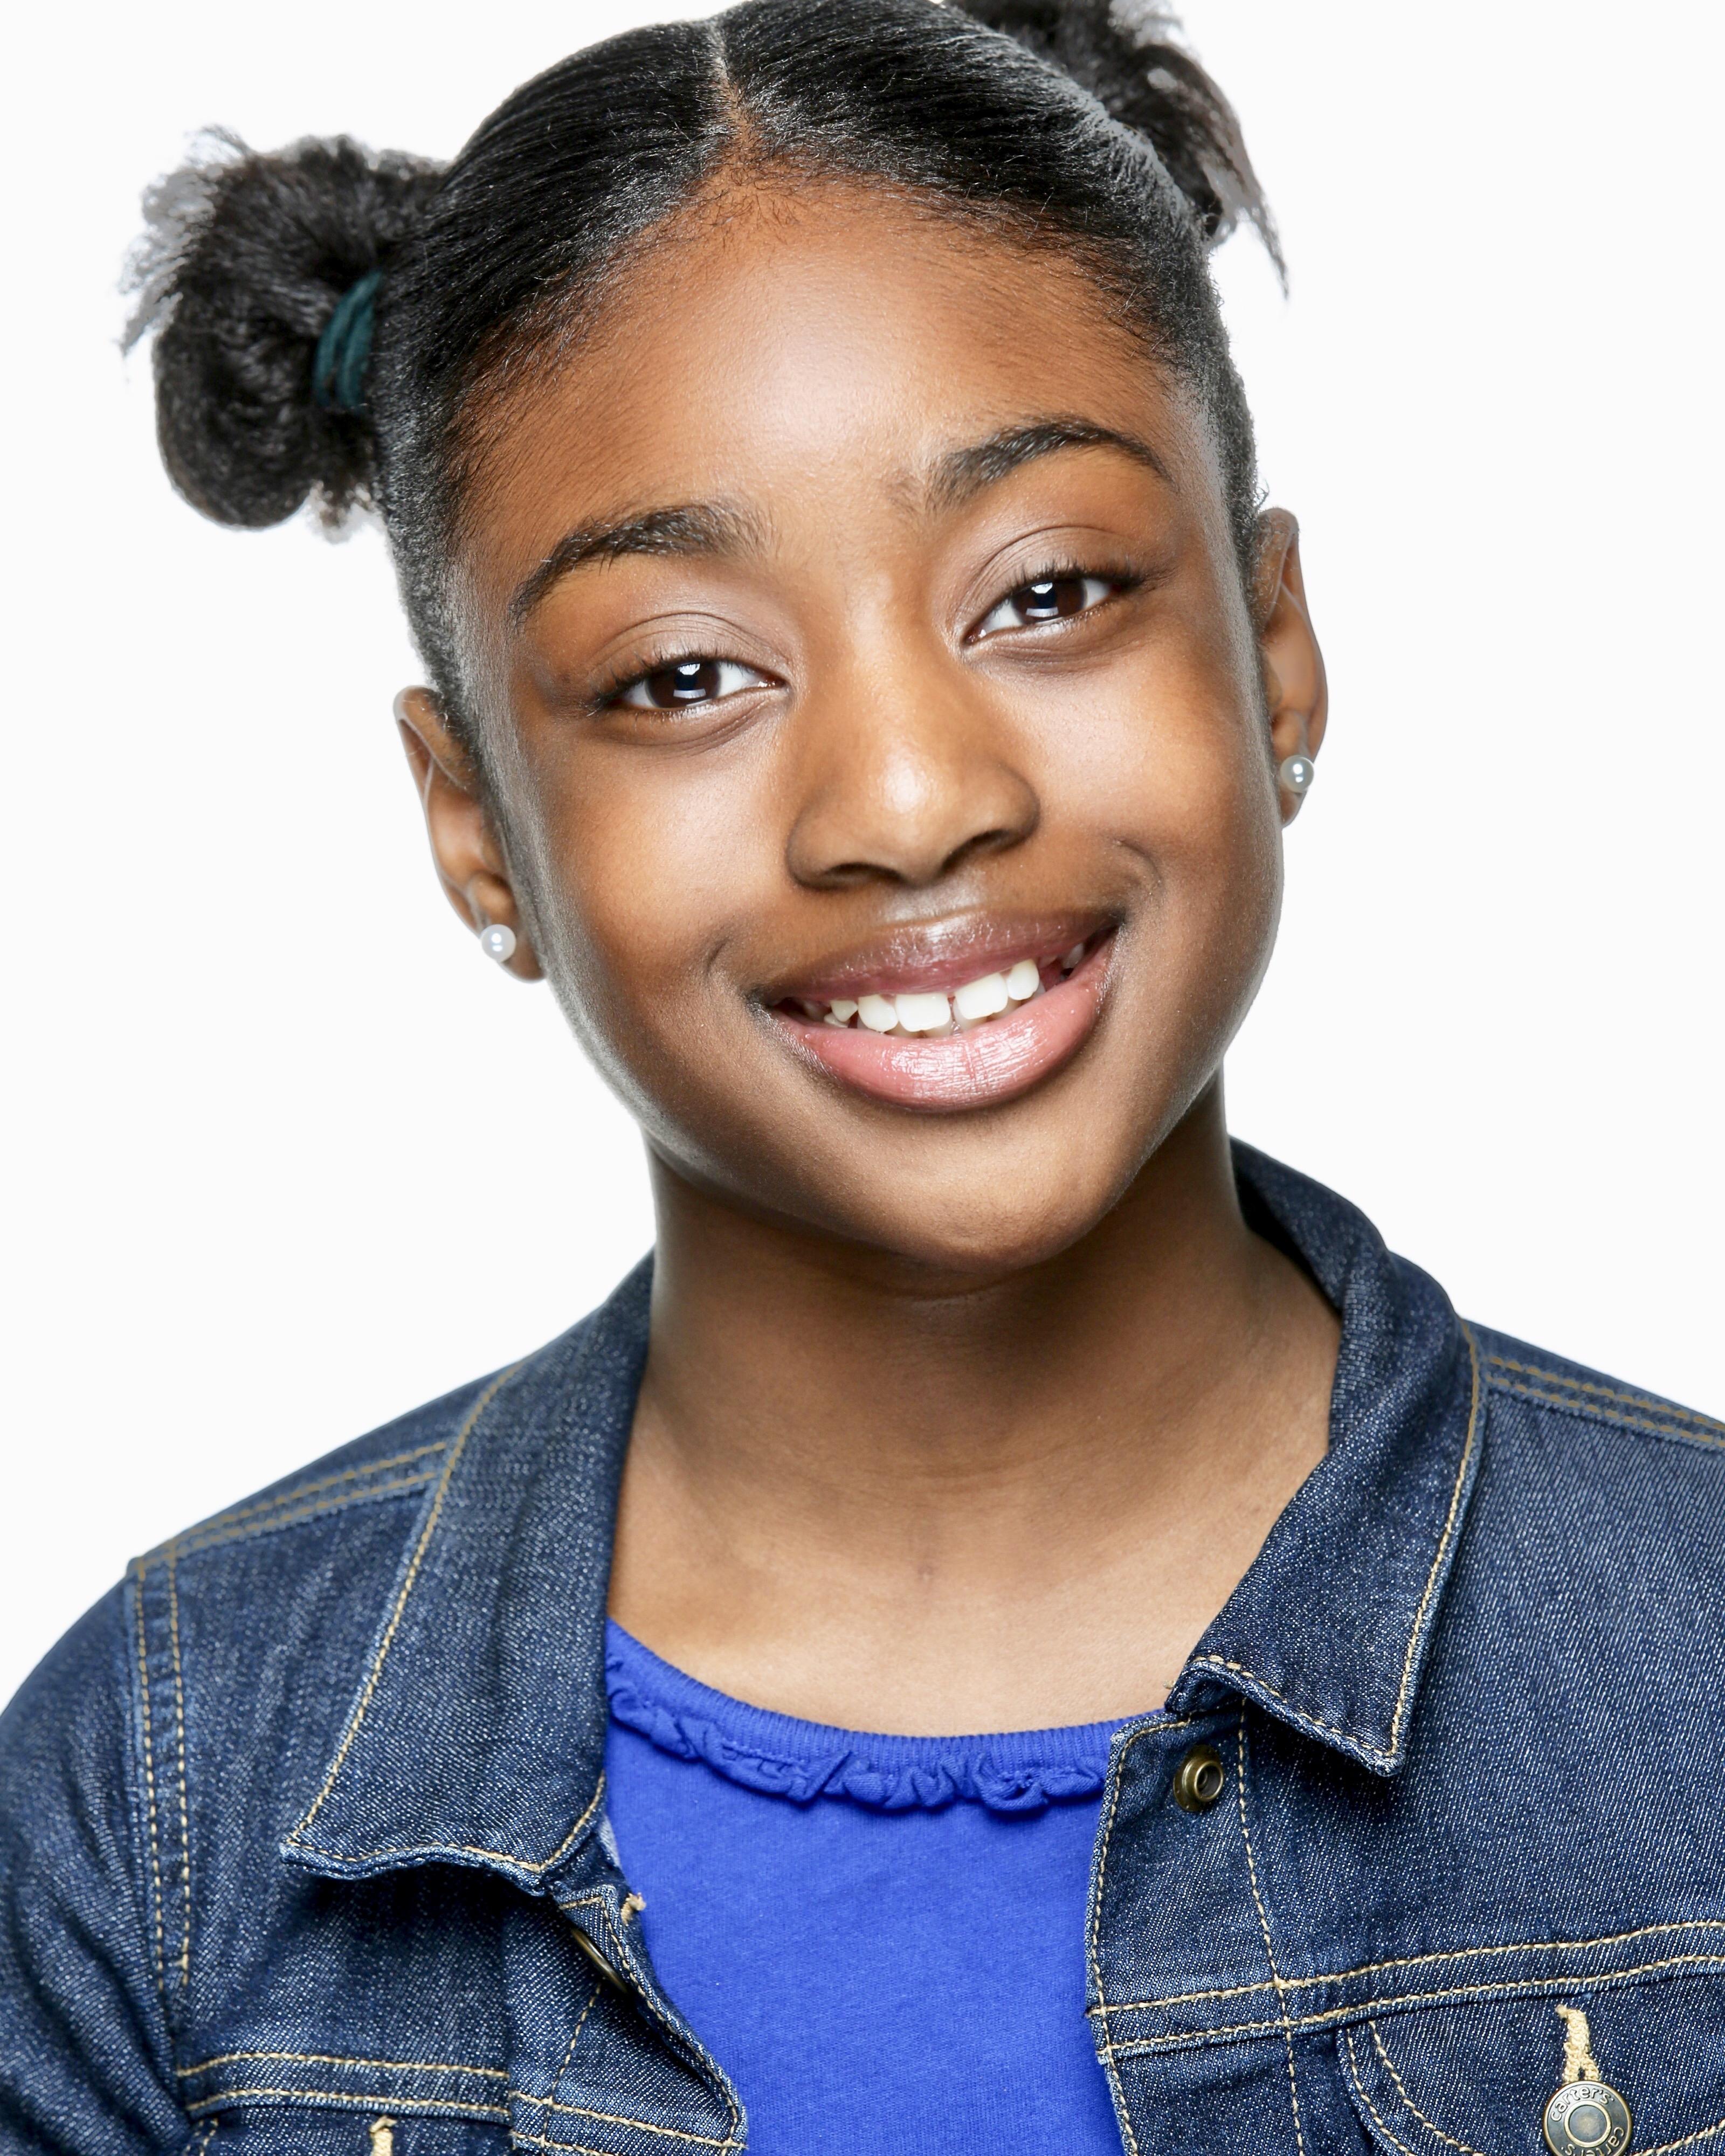 Taaliah-Grace Adewumi